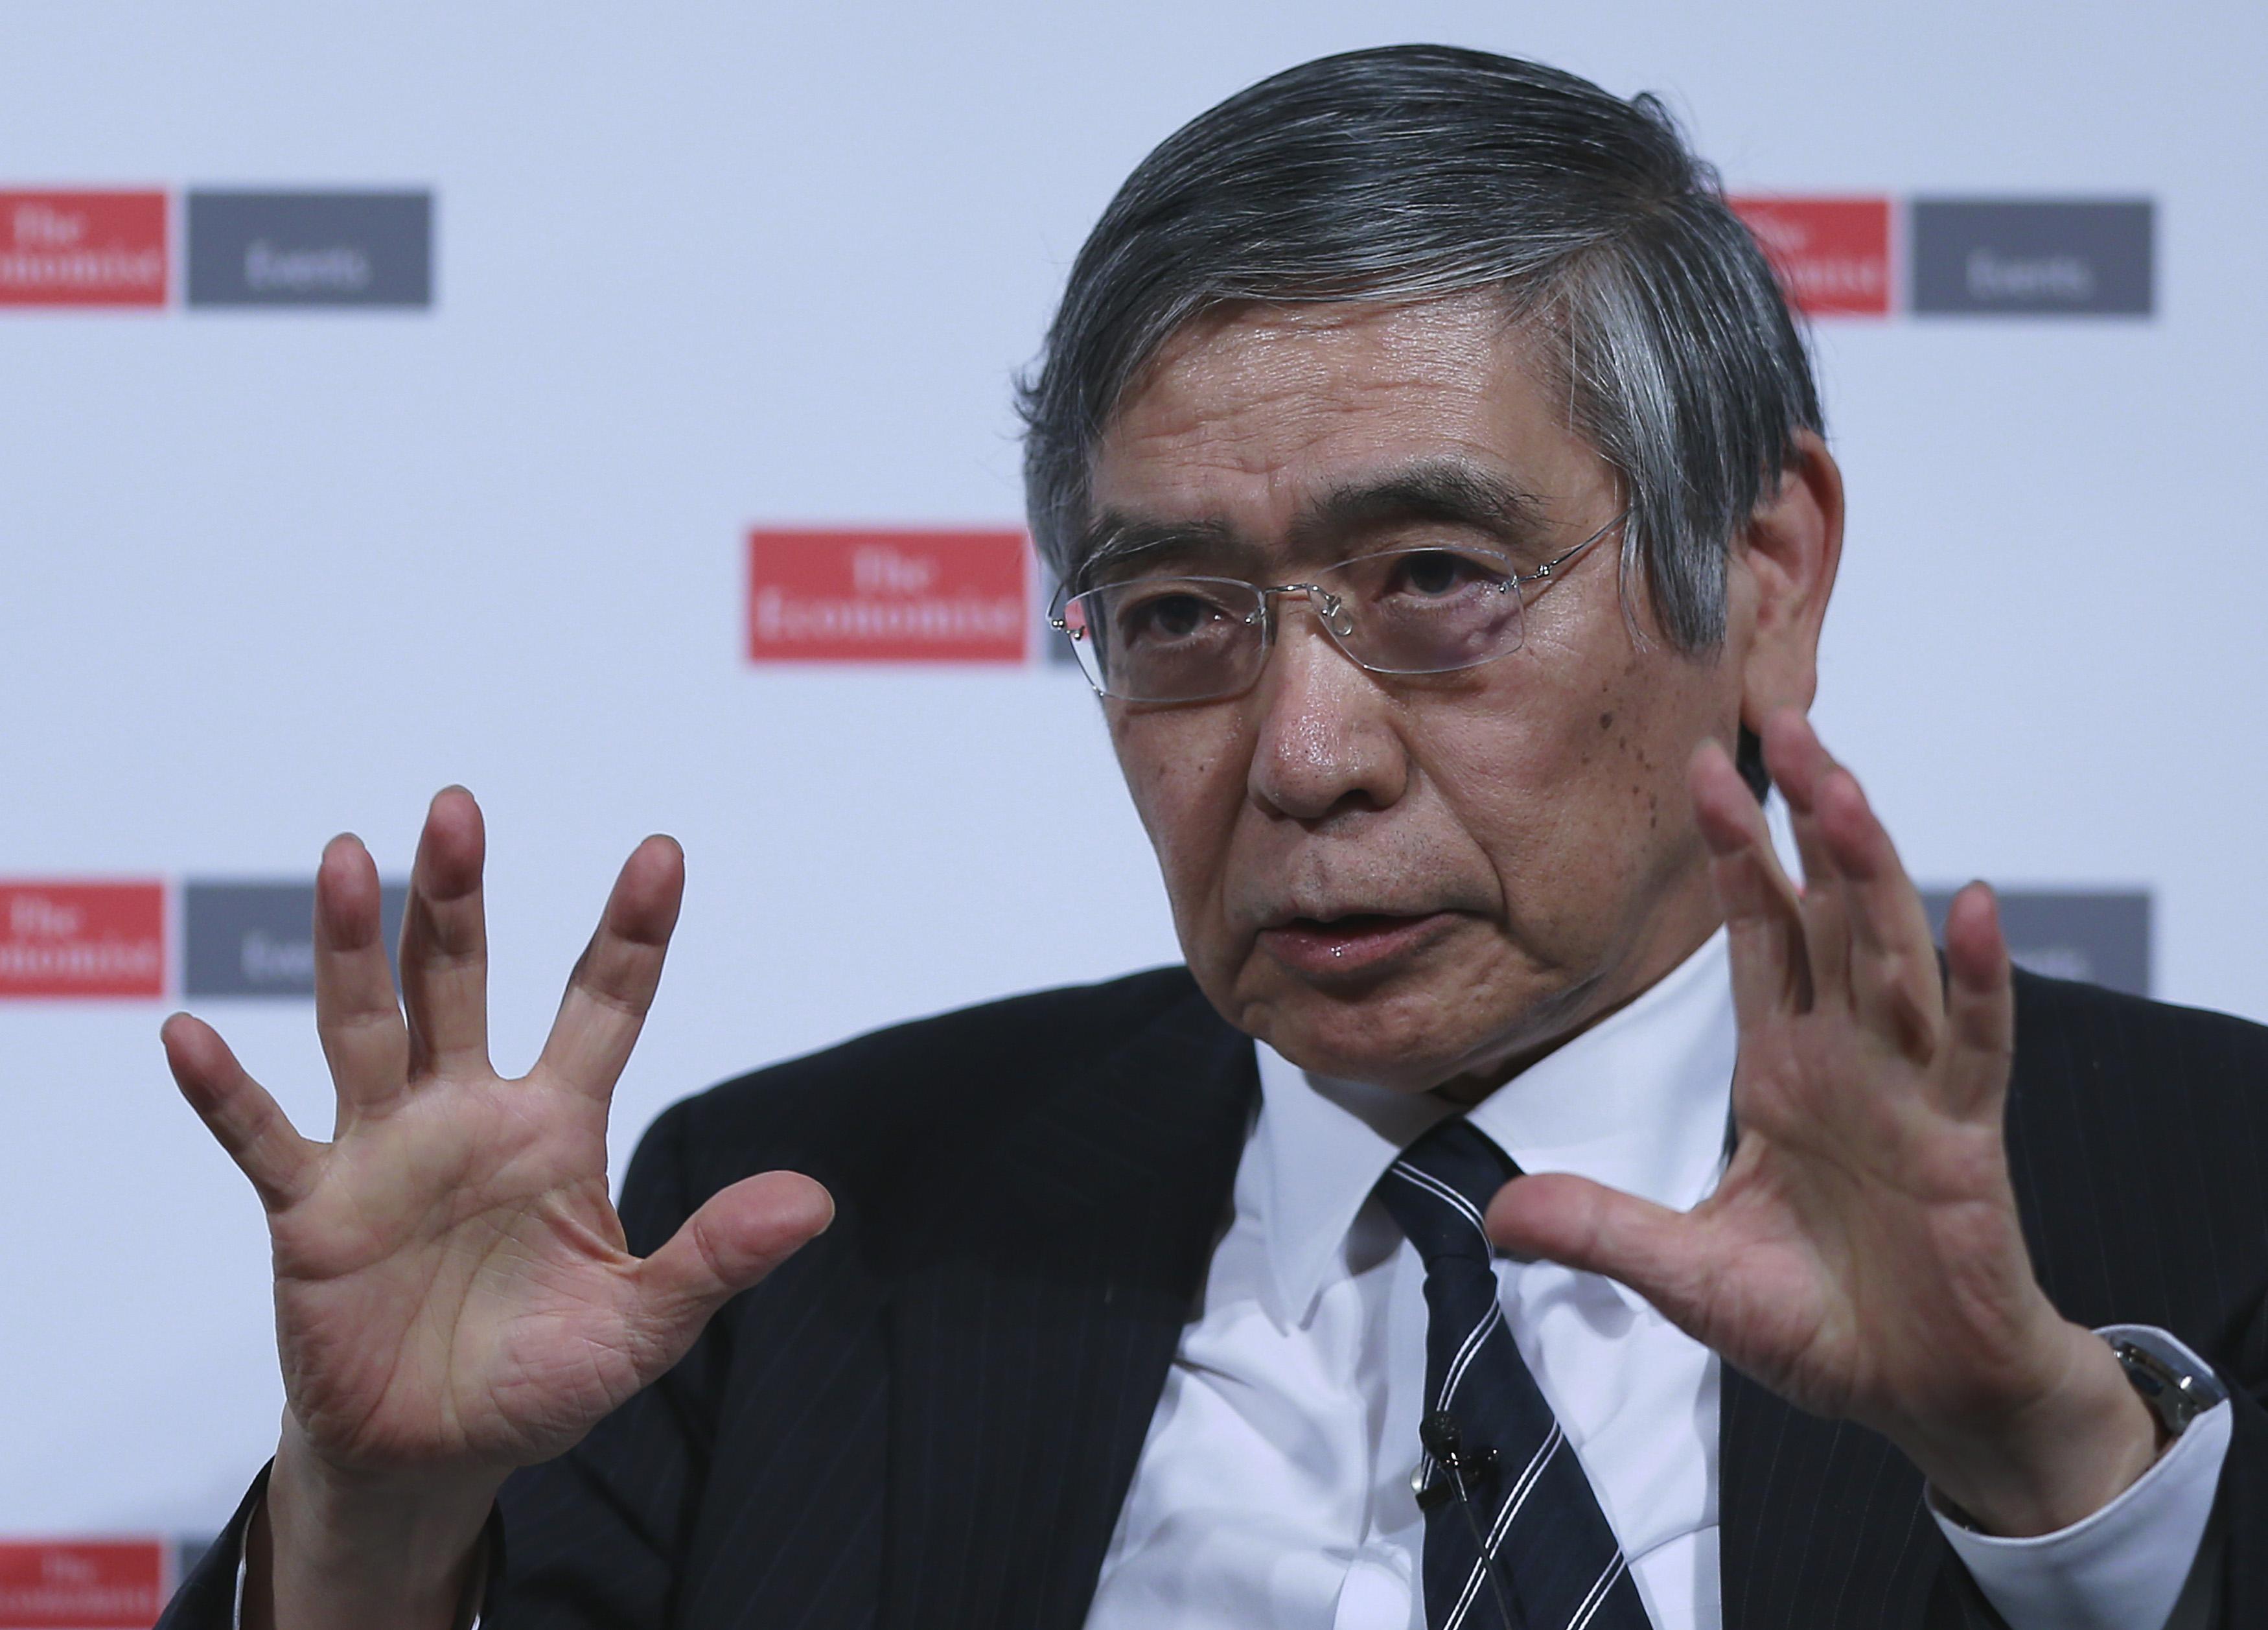 Bank Of Japan Governor Haruhiko Kuroda Speaks At The Economist Japan Summit